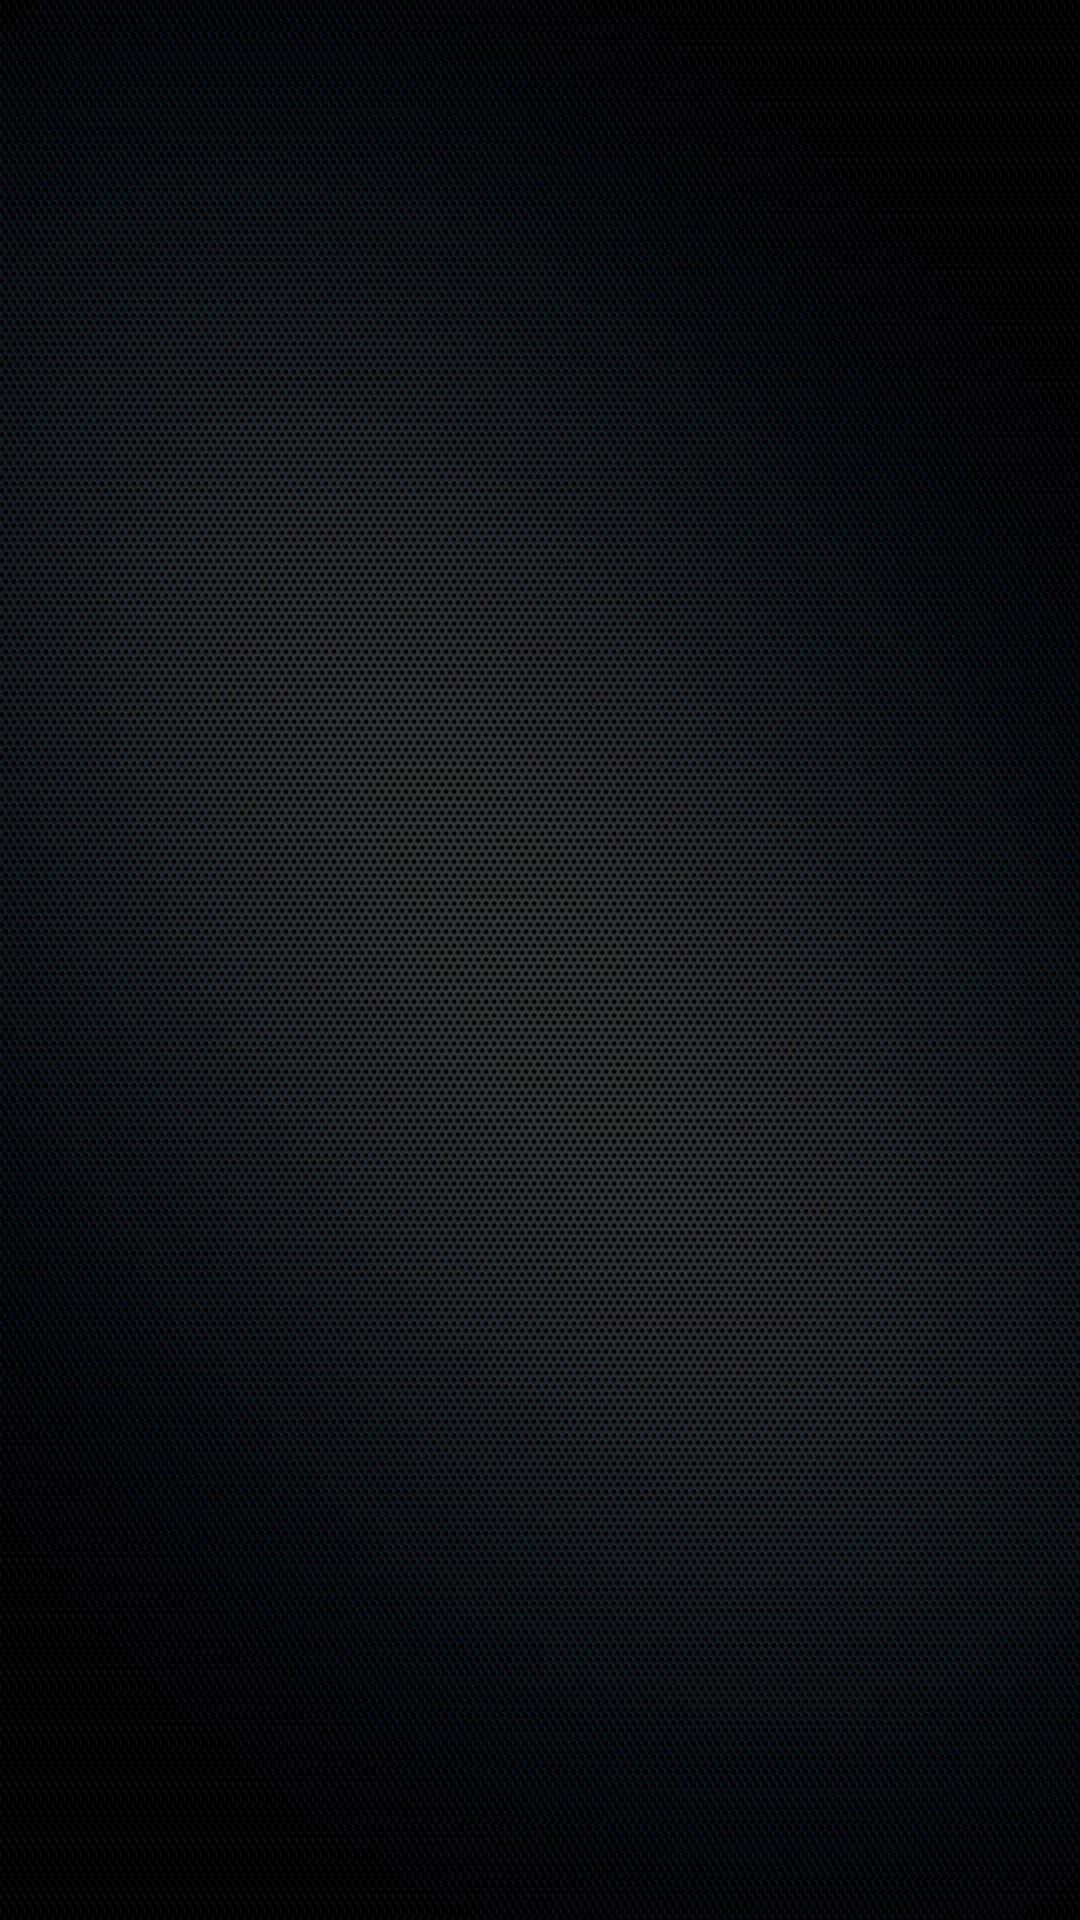 Carbon specs Smartphone wallpaper   iPhone Wallpaper